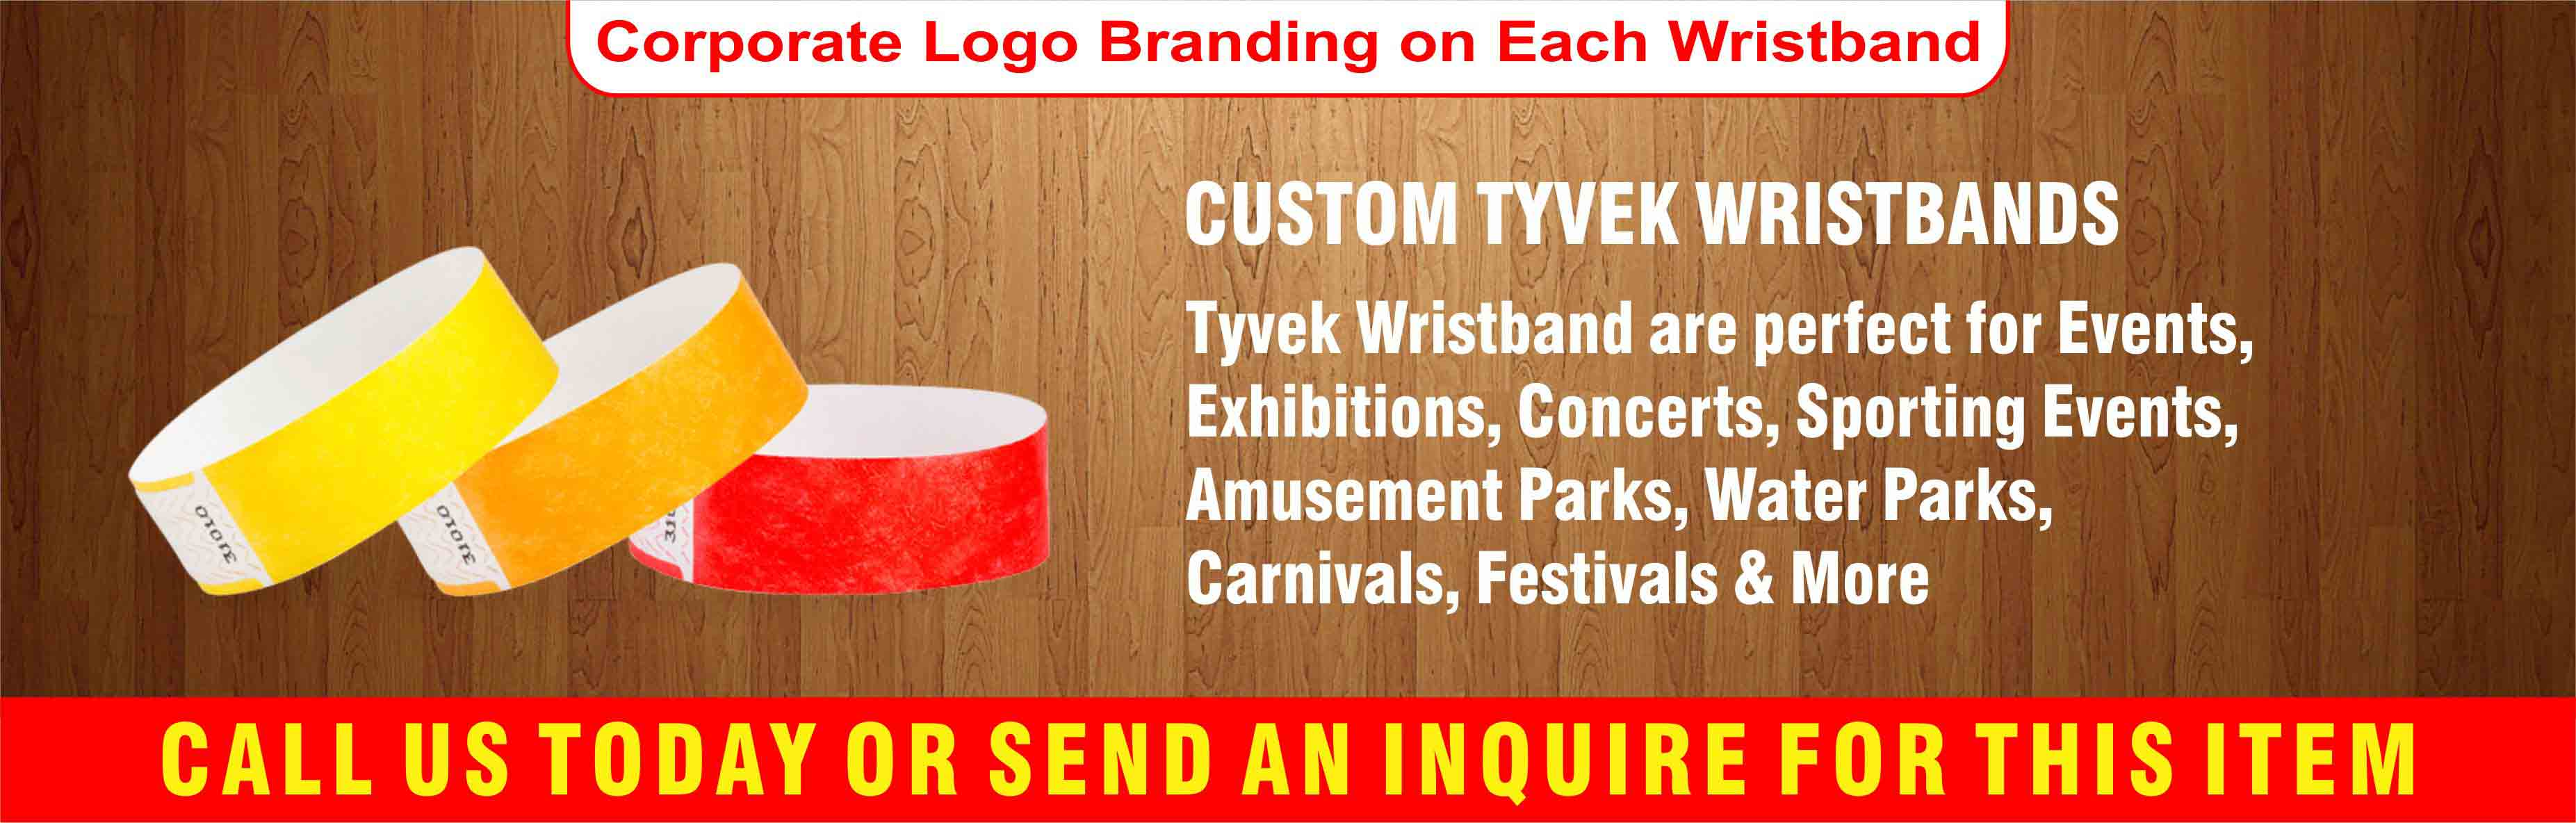 photograph regarding Printable Tyvek Wristbands named TYVEK WRISTBANDS - Kitaab Alyom